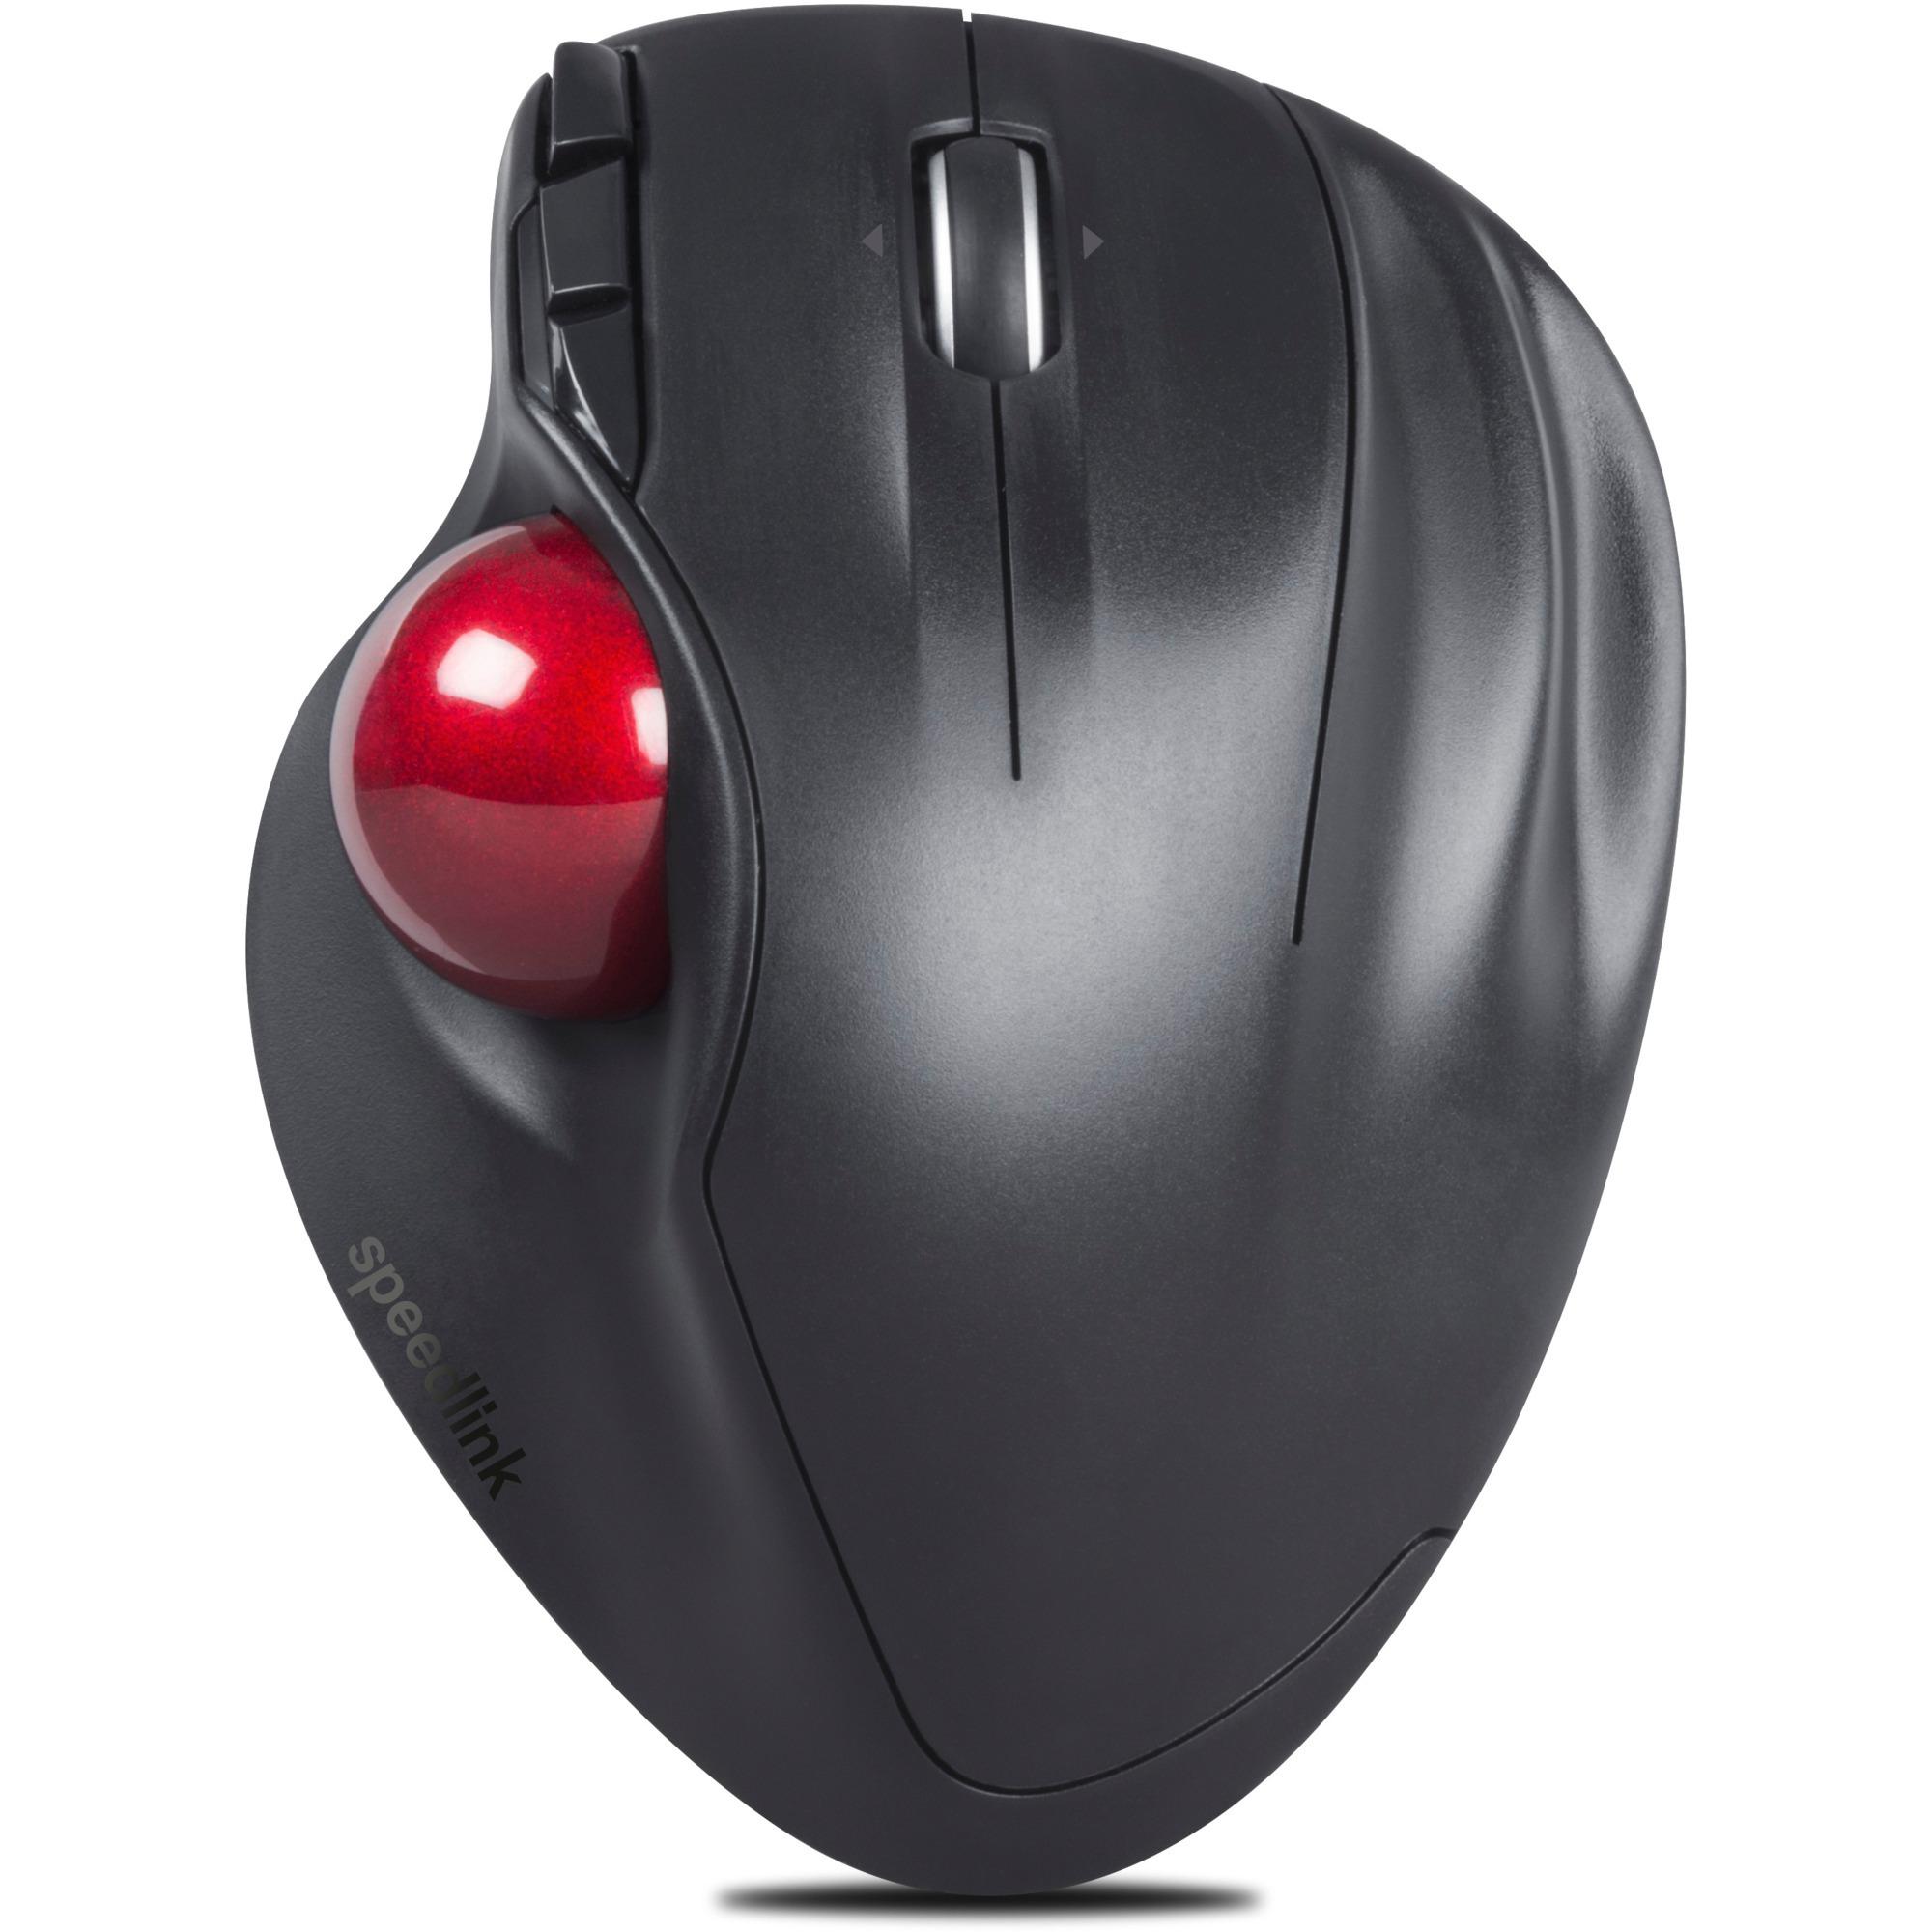 APTICO RF inalámbrico Laser 1600DPI mano derecha Negro ratón, Trackball